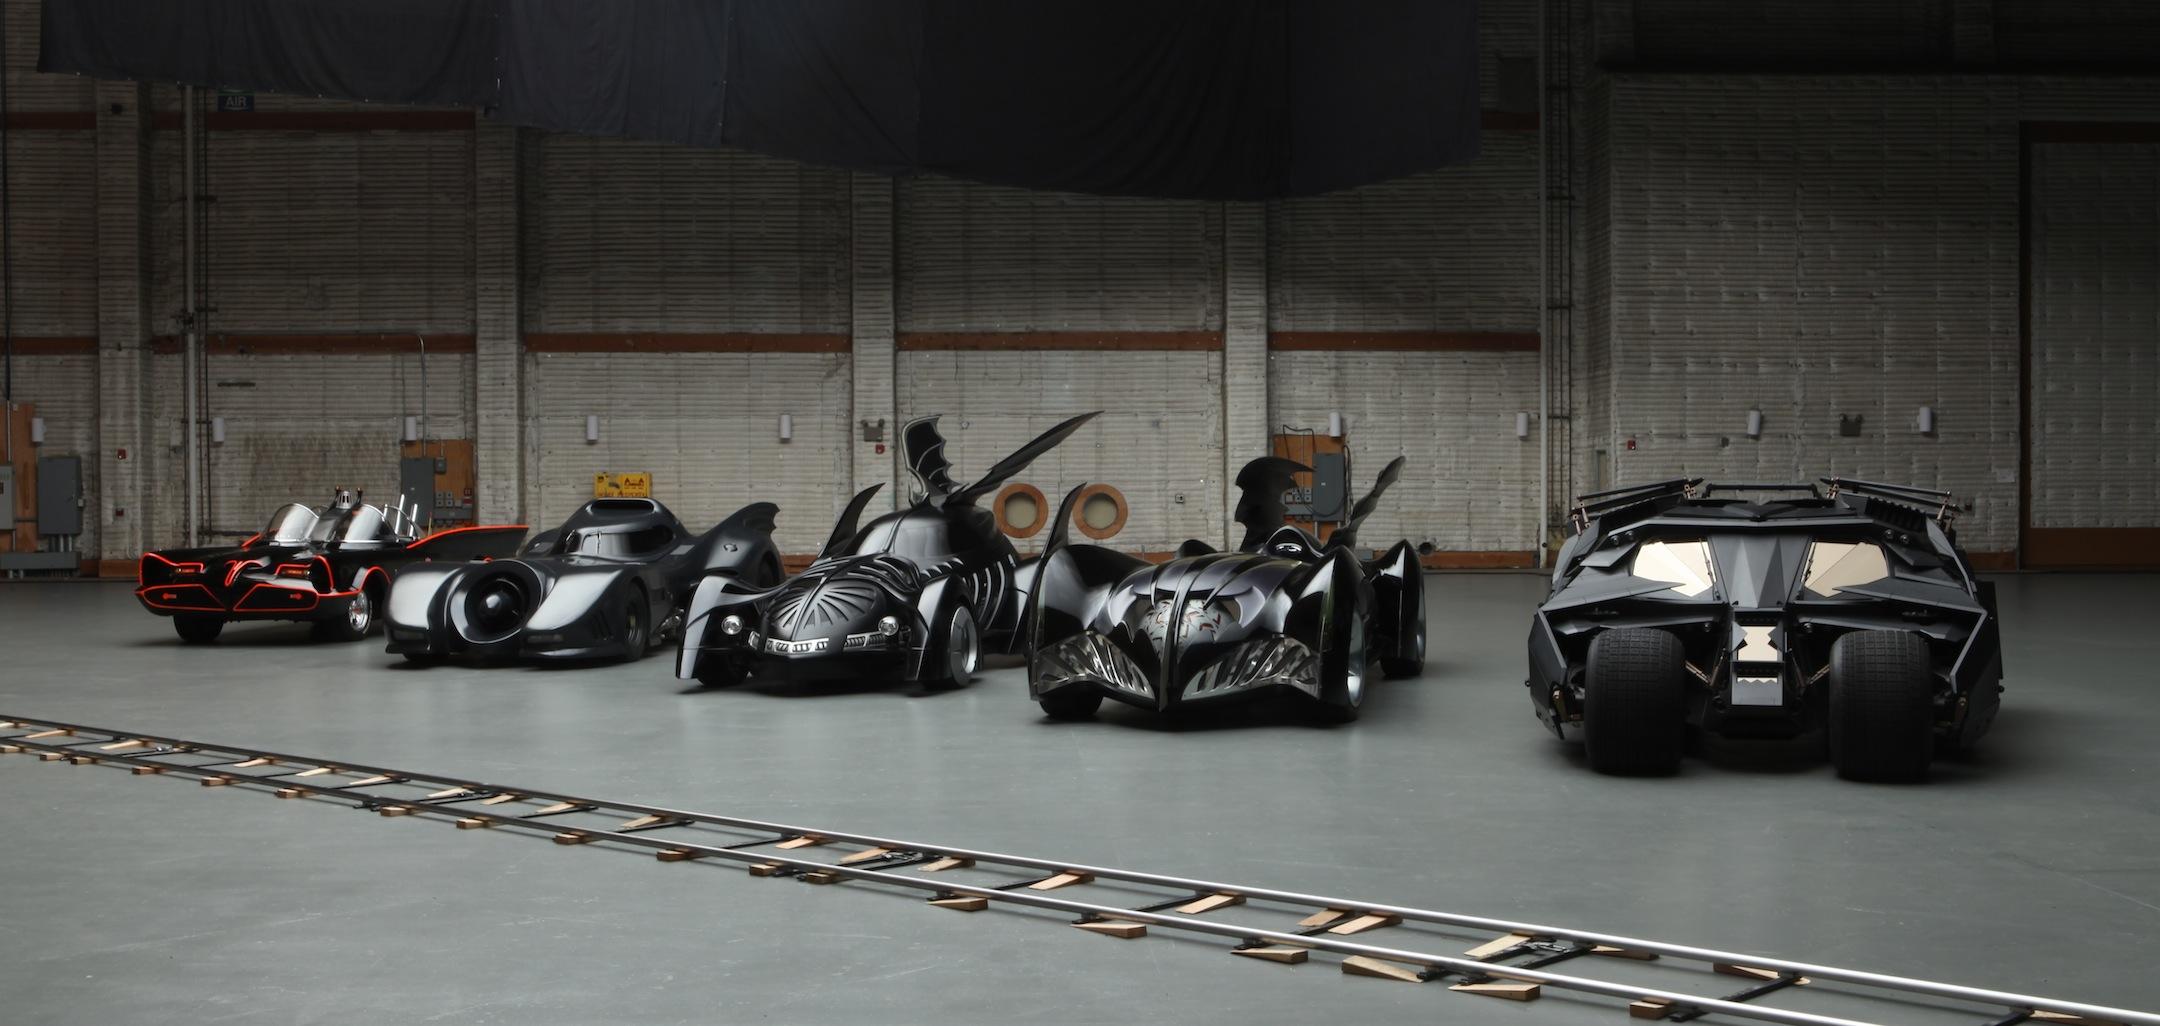 batman-arkham-knight-uno-sguardo-alla-batmobile_5rru